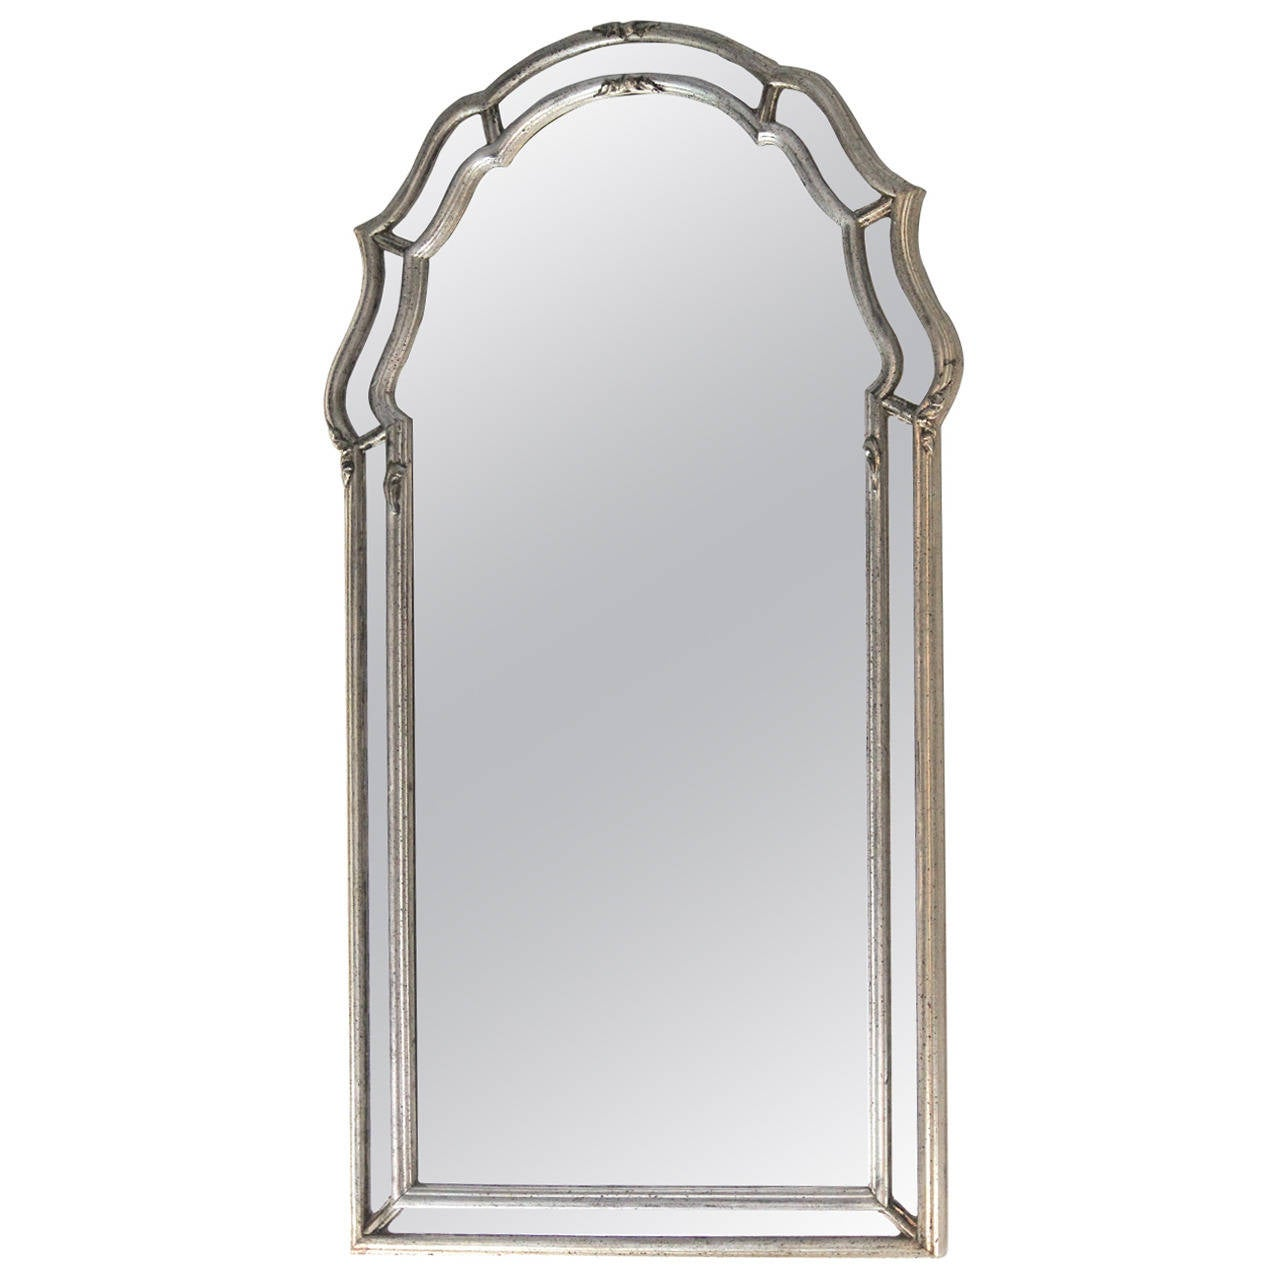 Mid-Century La Barge Italian Regency Double Frame Aged Silver Leaf Mirror